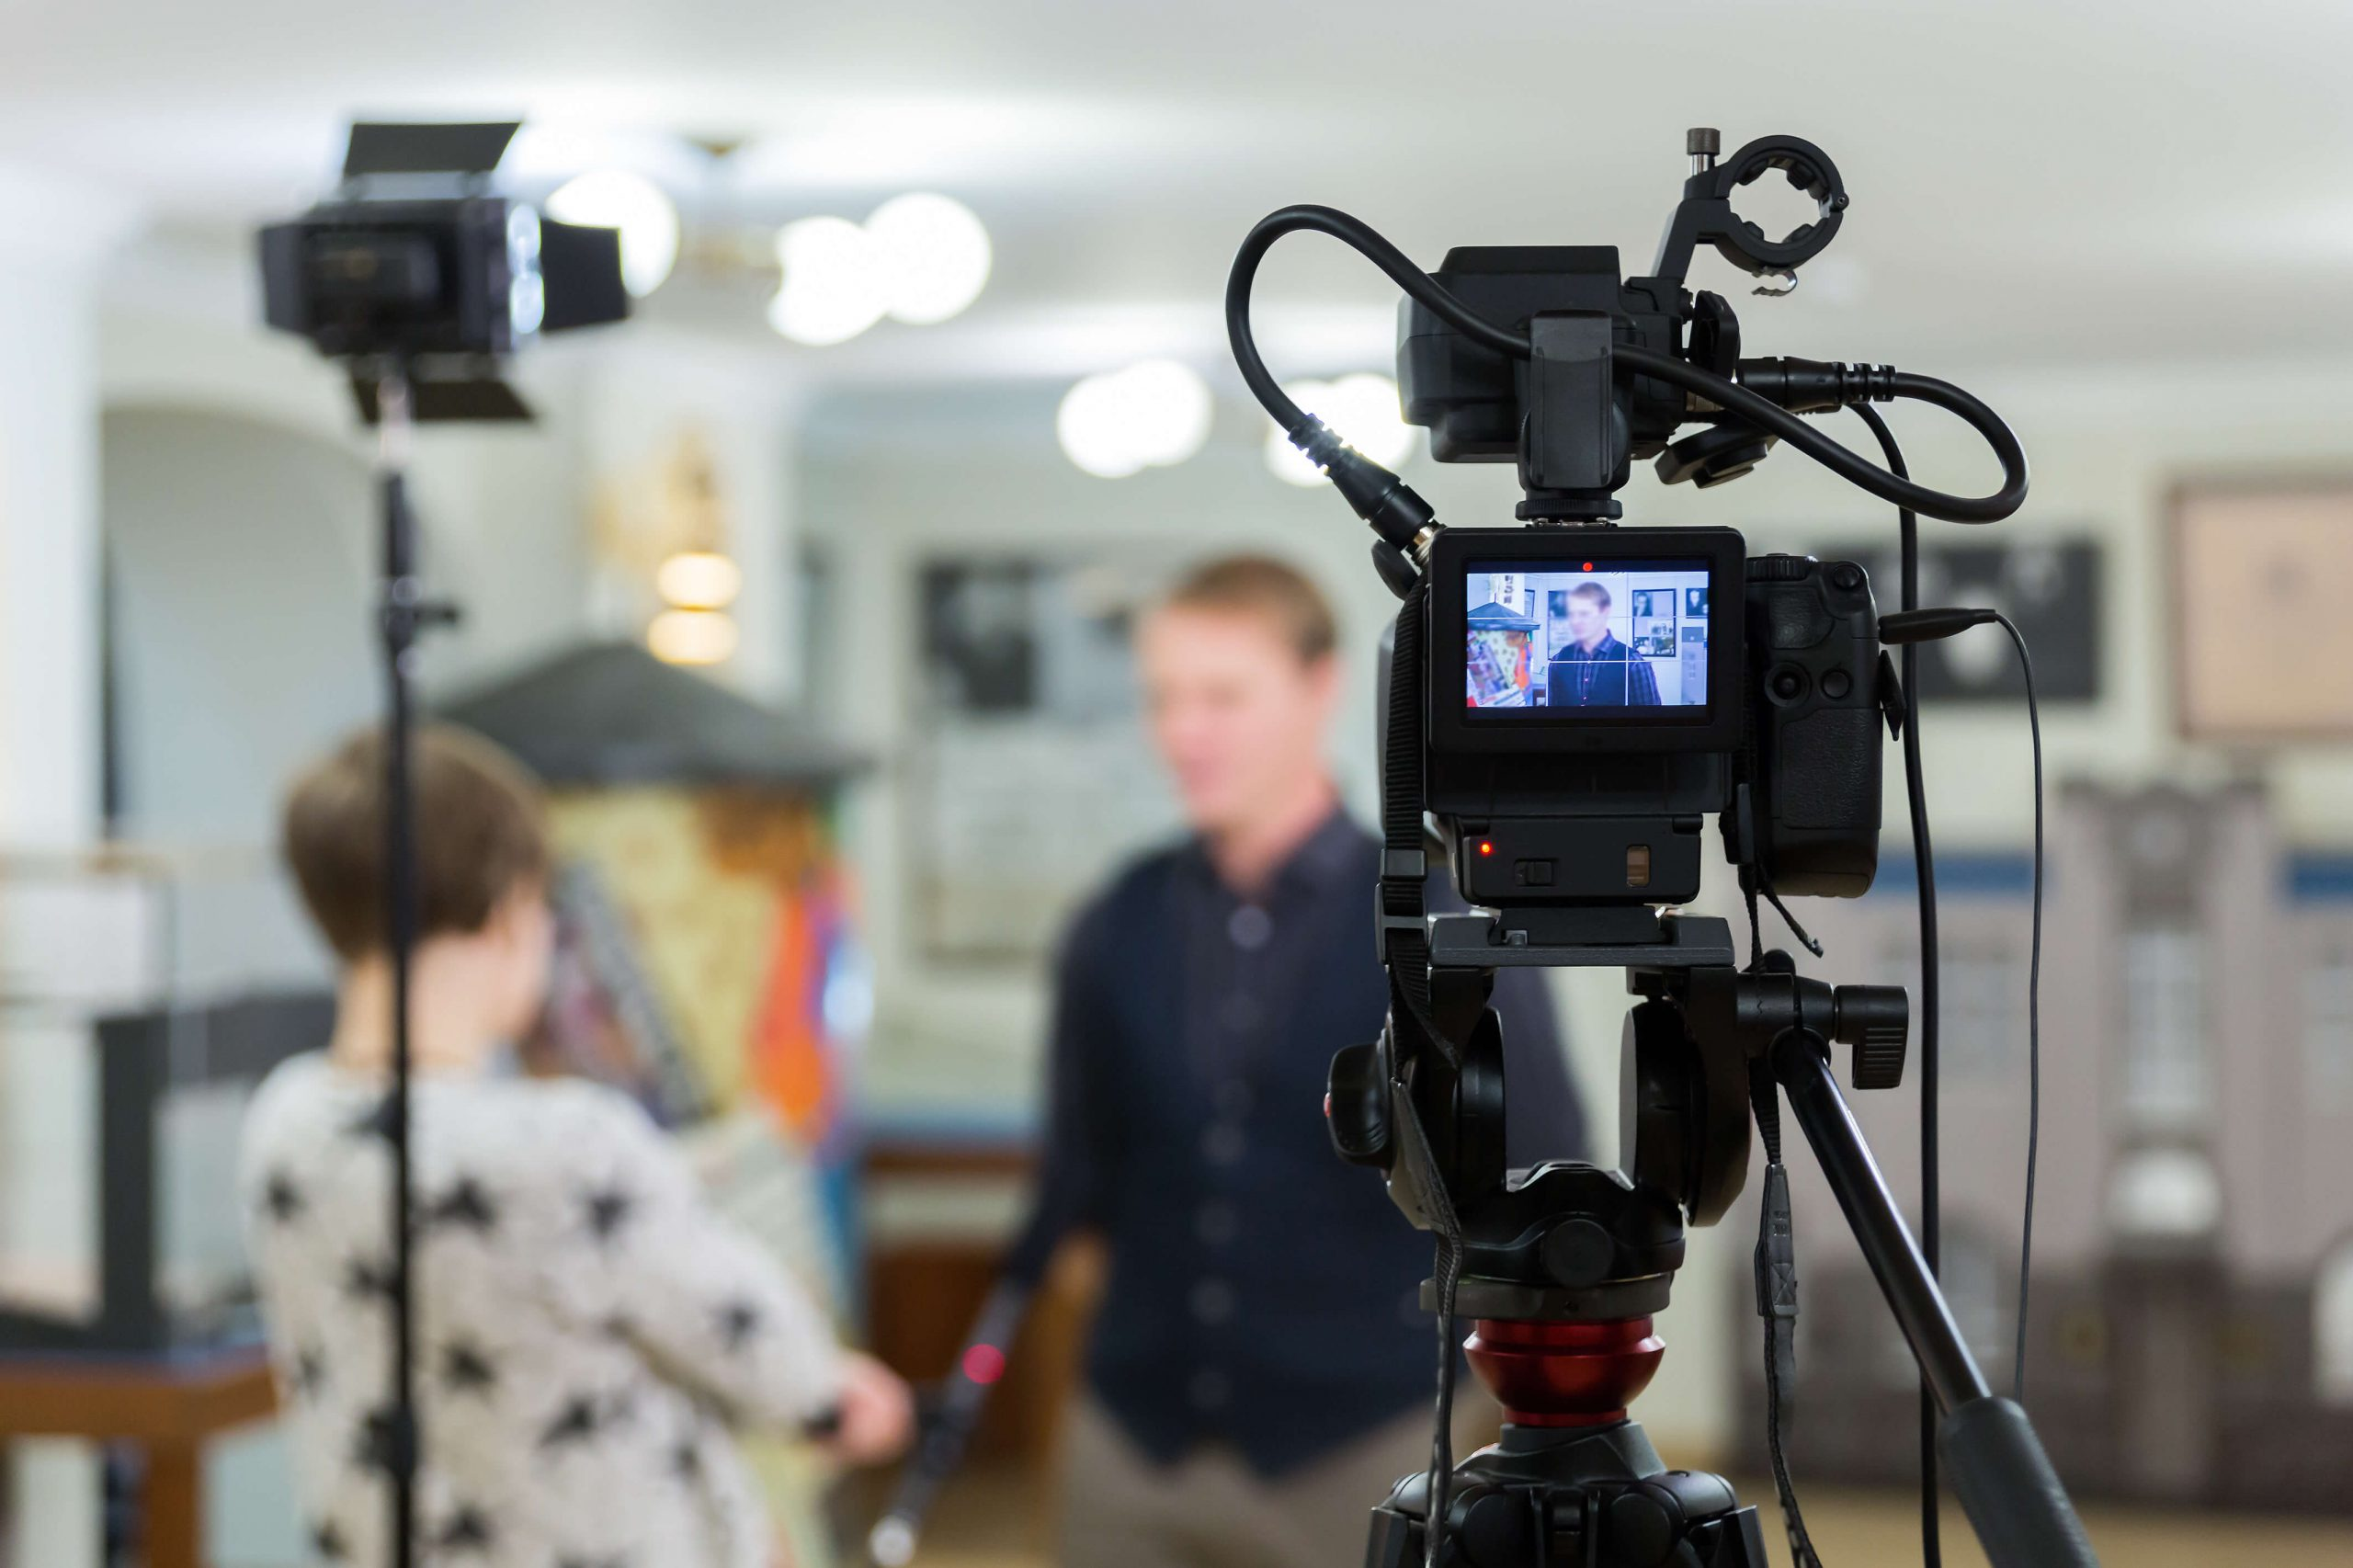 Video of interview with studio equipment